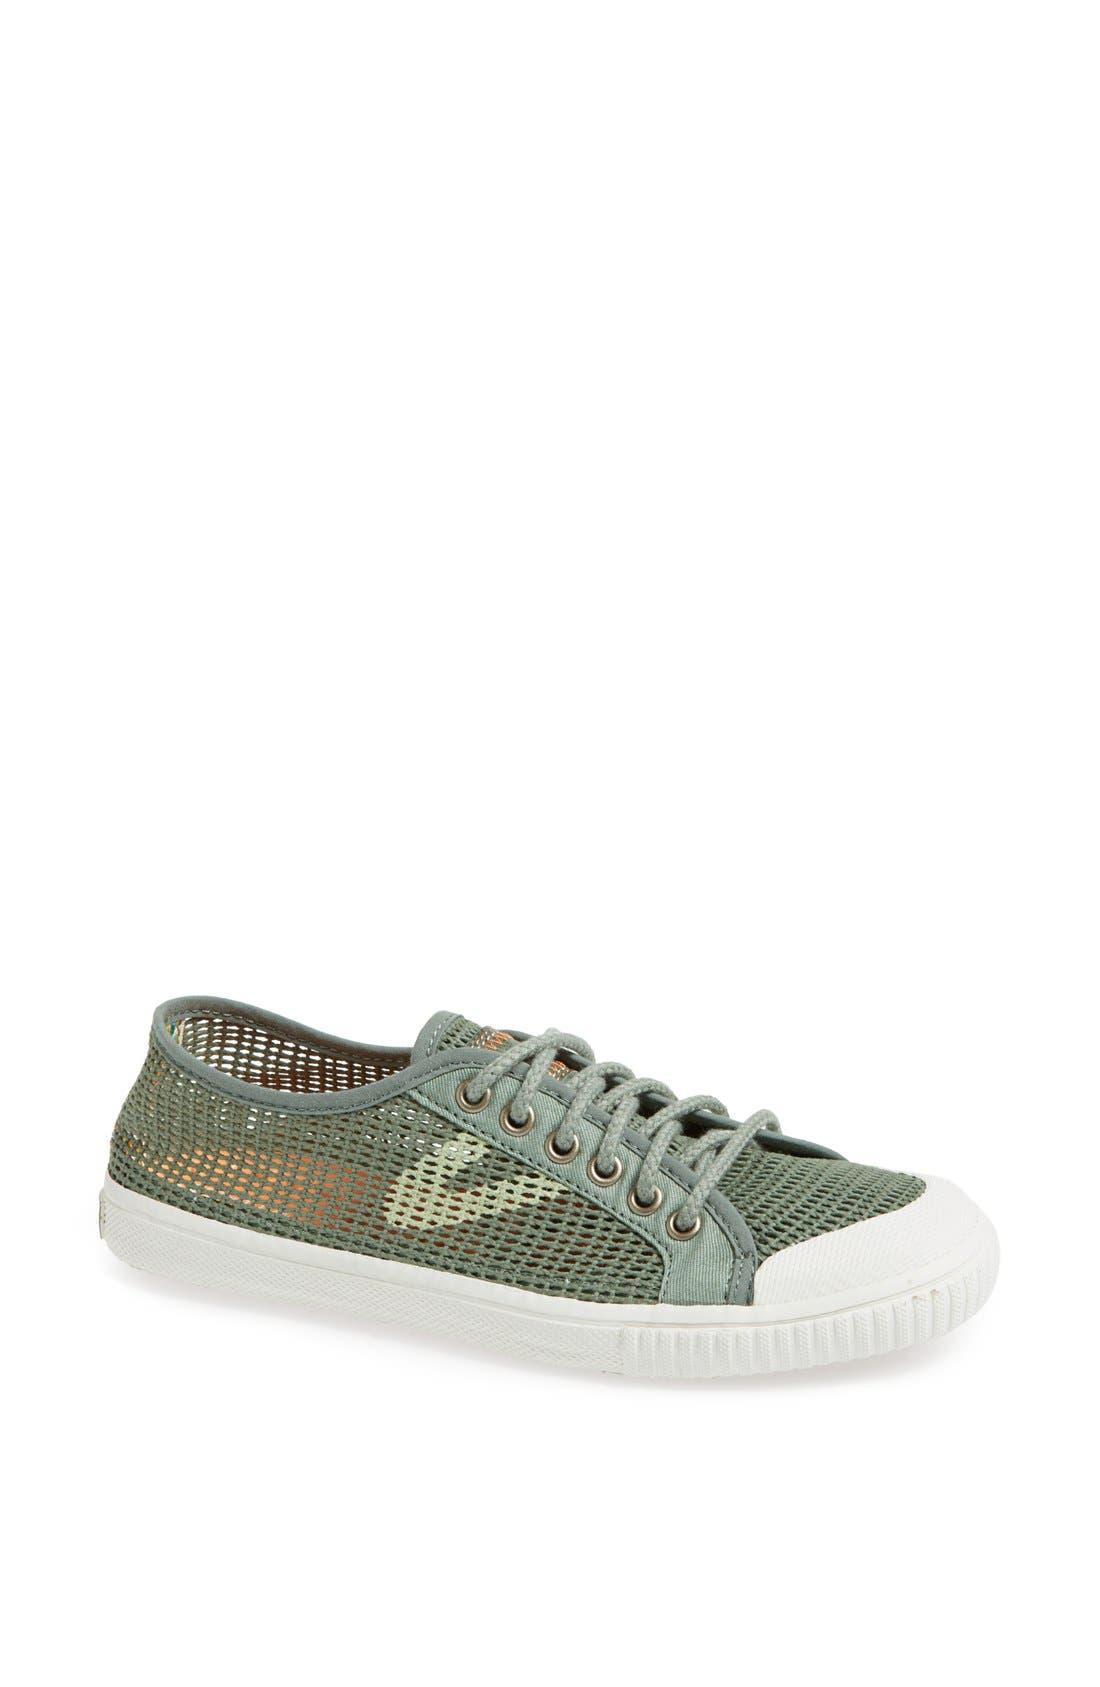 Main Image - Tretorn 'Skesti' Sneaker (Women)